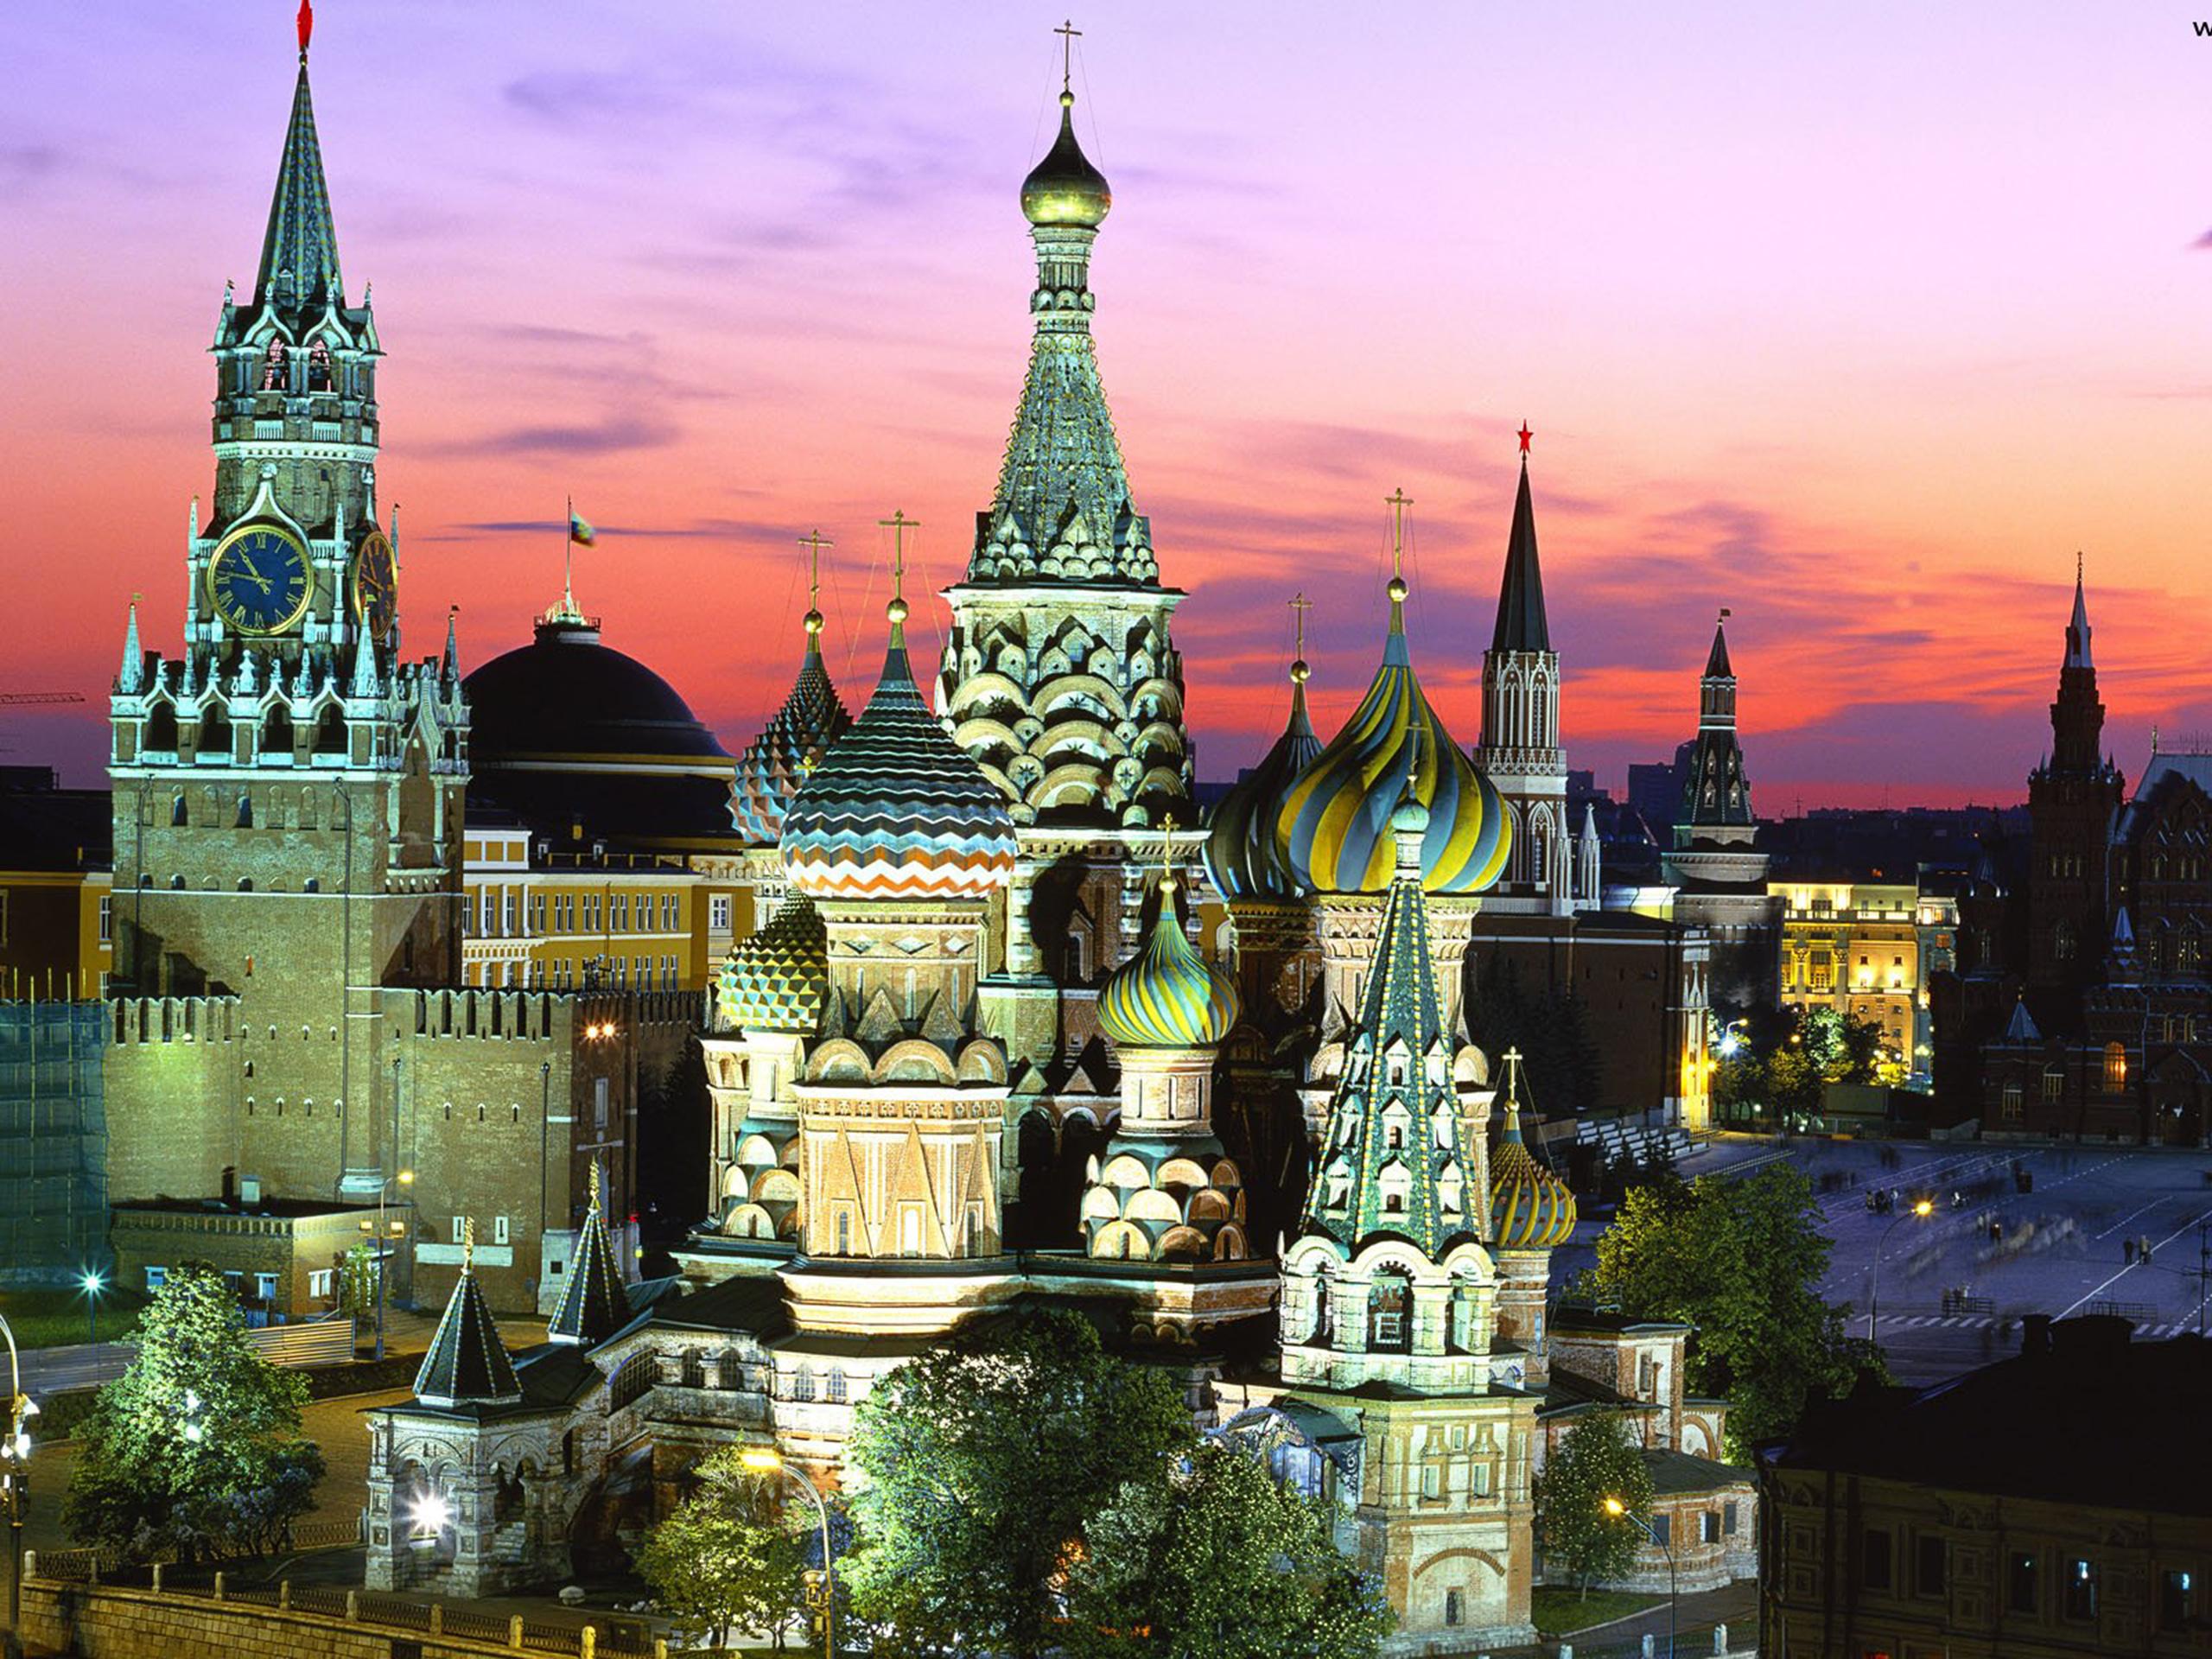 Фонтан Donnerbrunnen, Вена, Австрия. Вид на Кремль Москва.